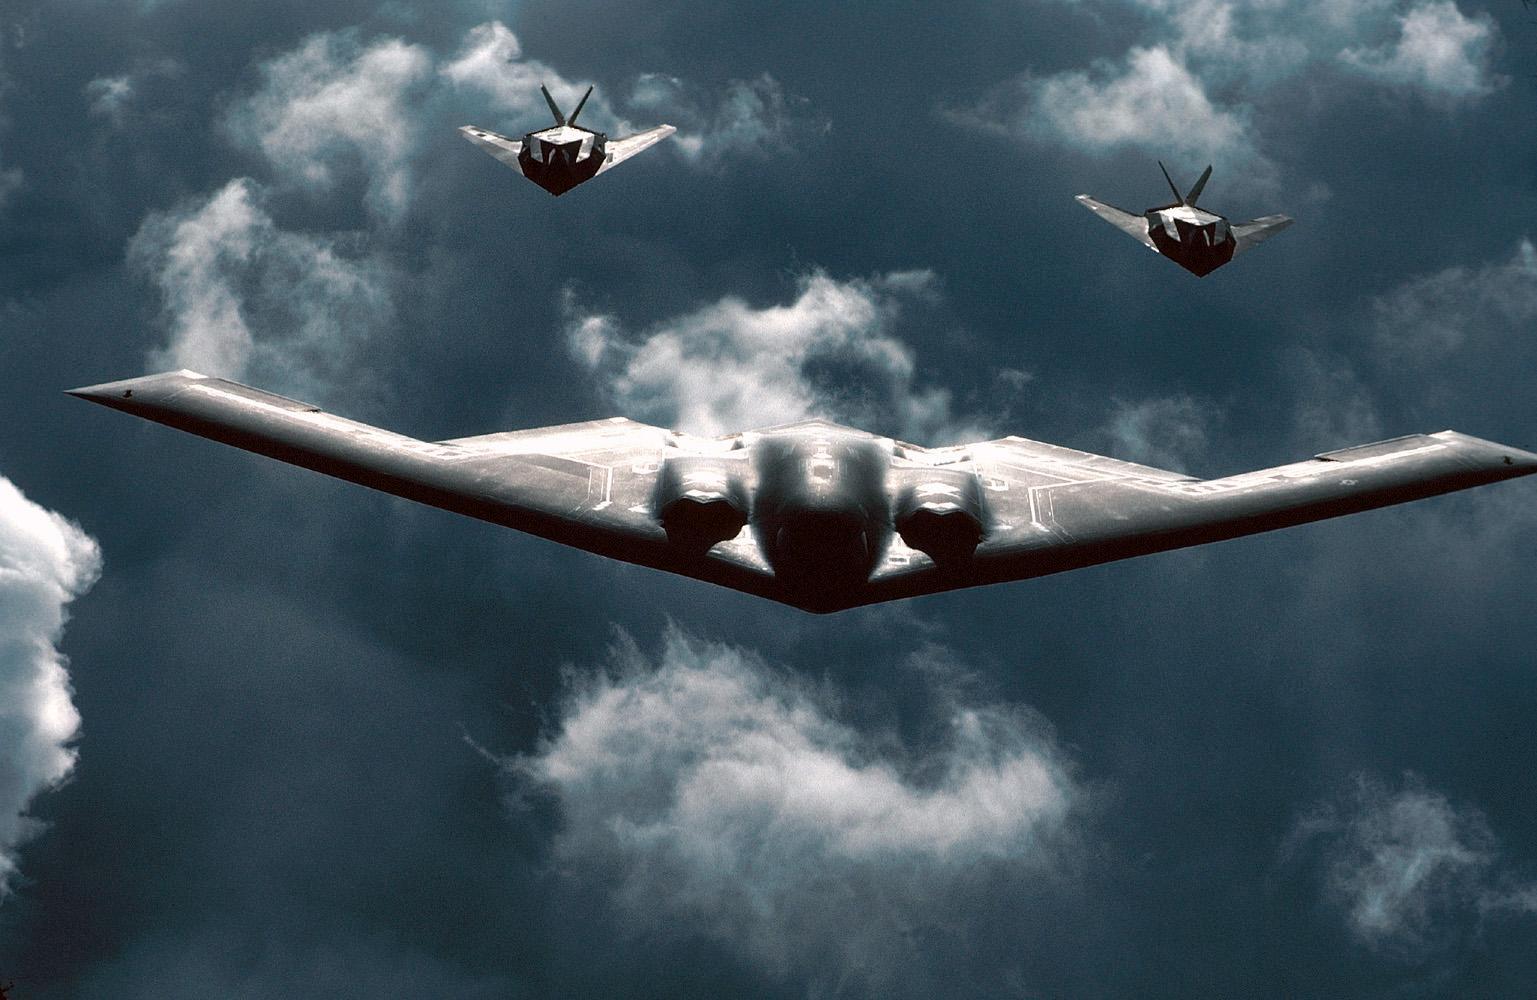 Northrop Grumman B 2 Spirit Wallpaper 8   1537 X 1000 stmednet 1537x1000